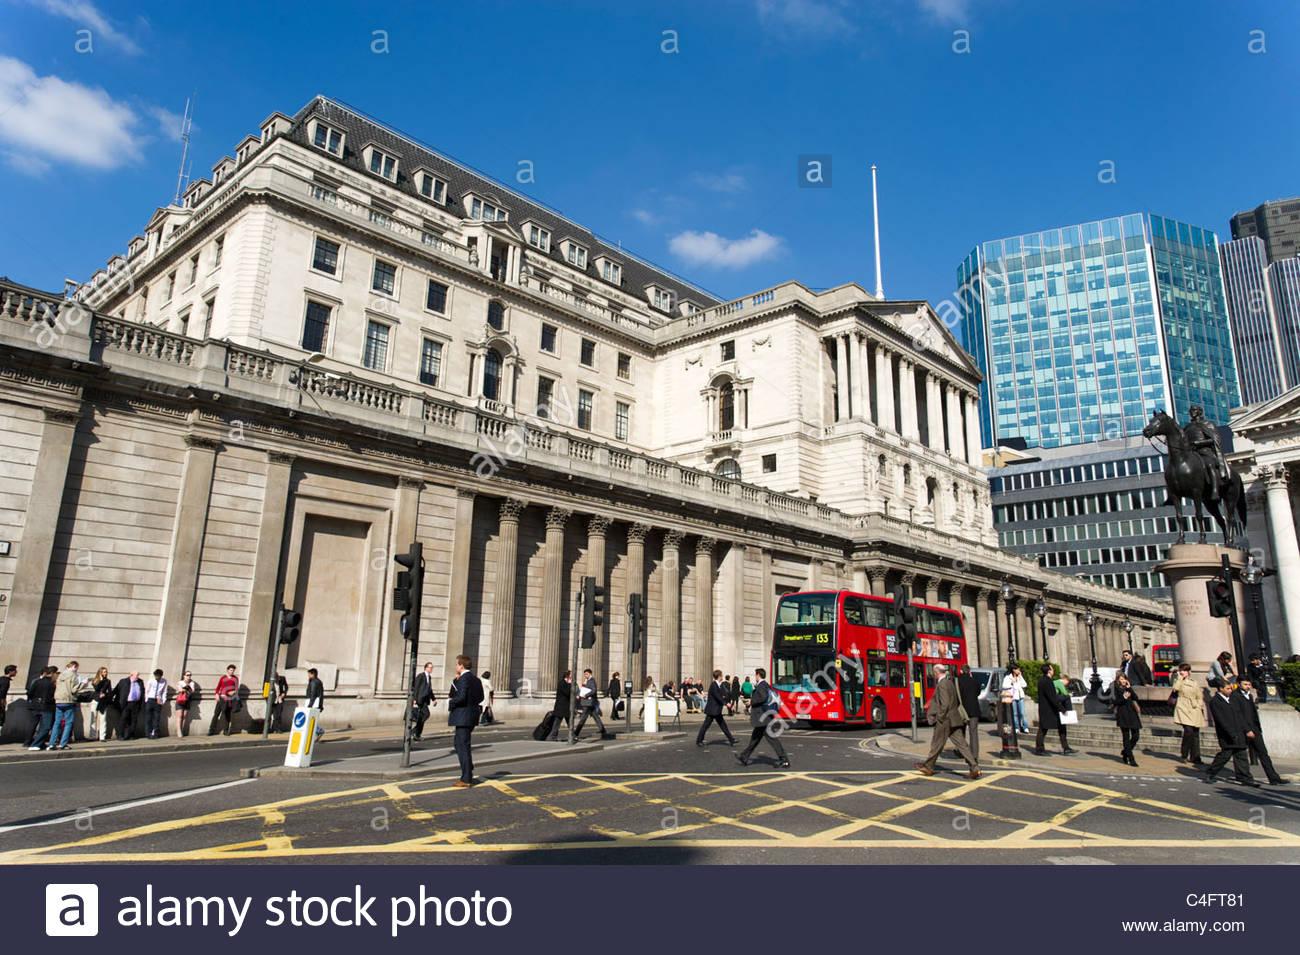 La Banque d'Angleterre, Londres, UK Photo Stock